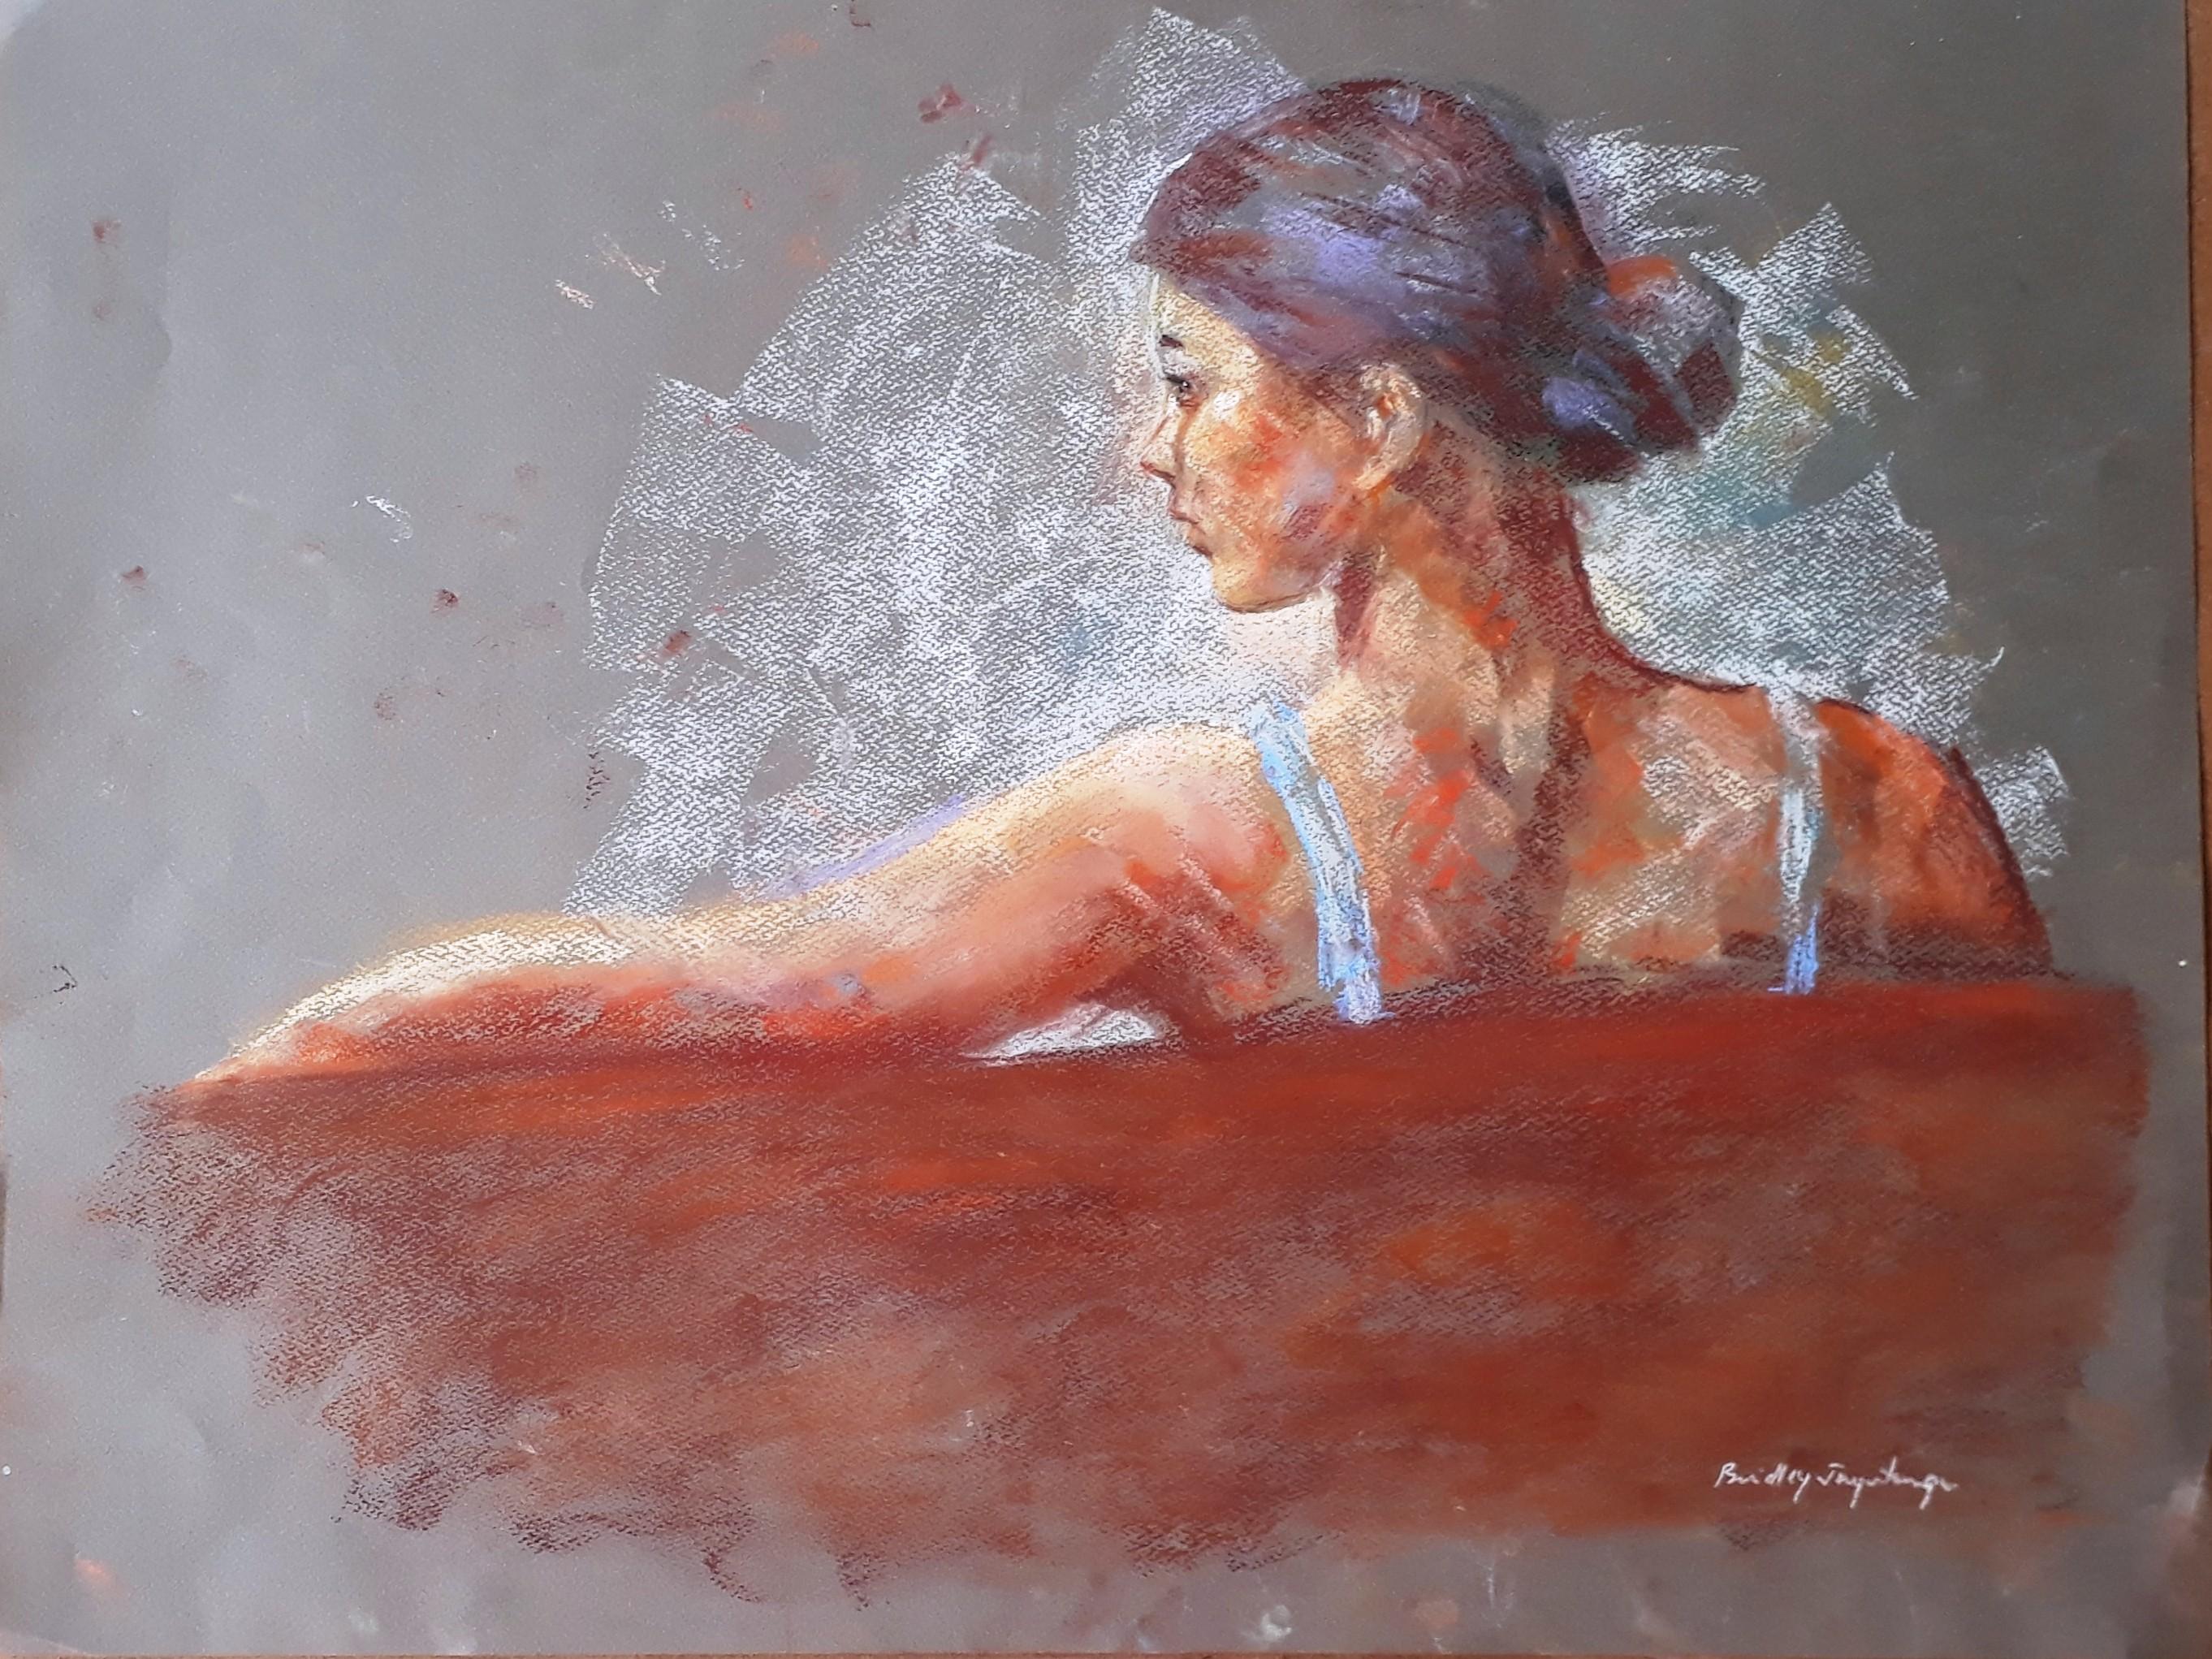 Pensive mood by Brindley Jayatunga